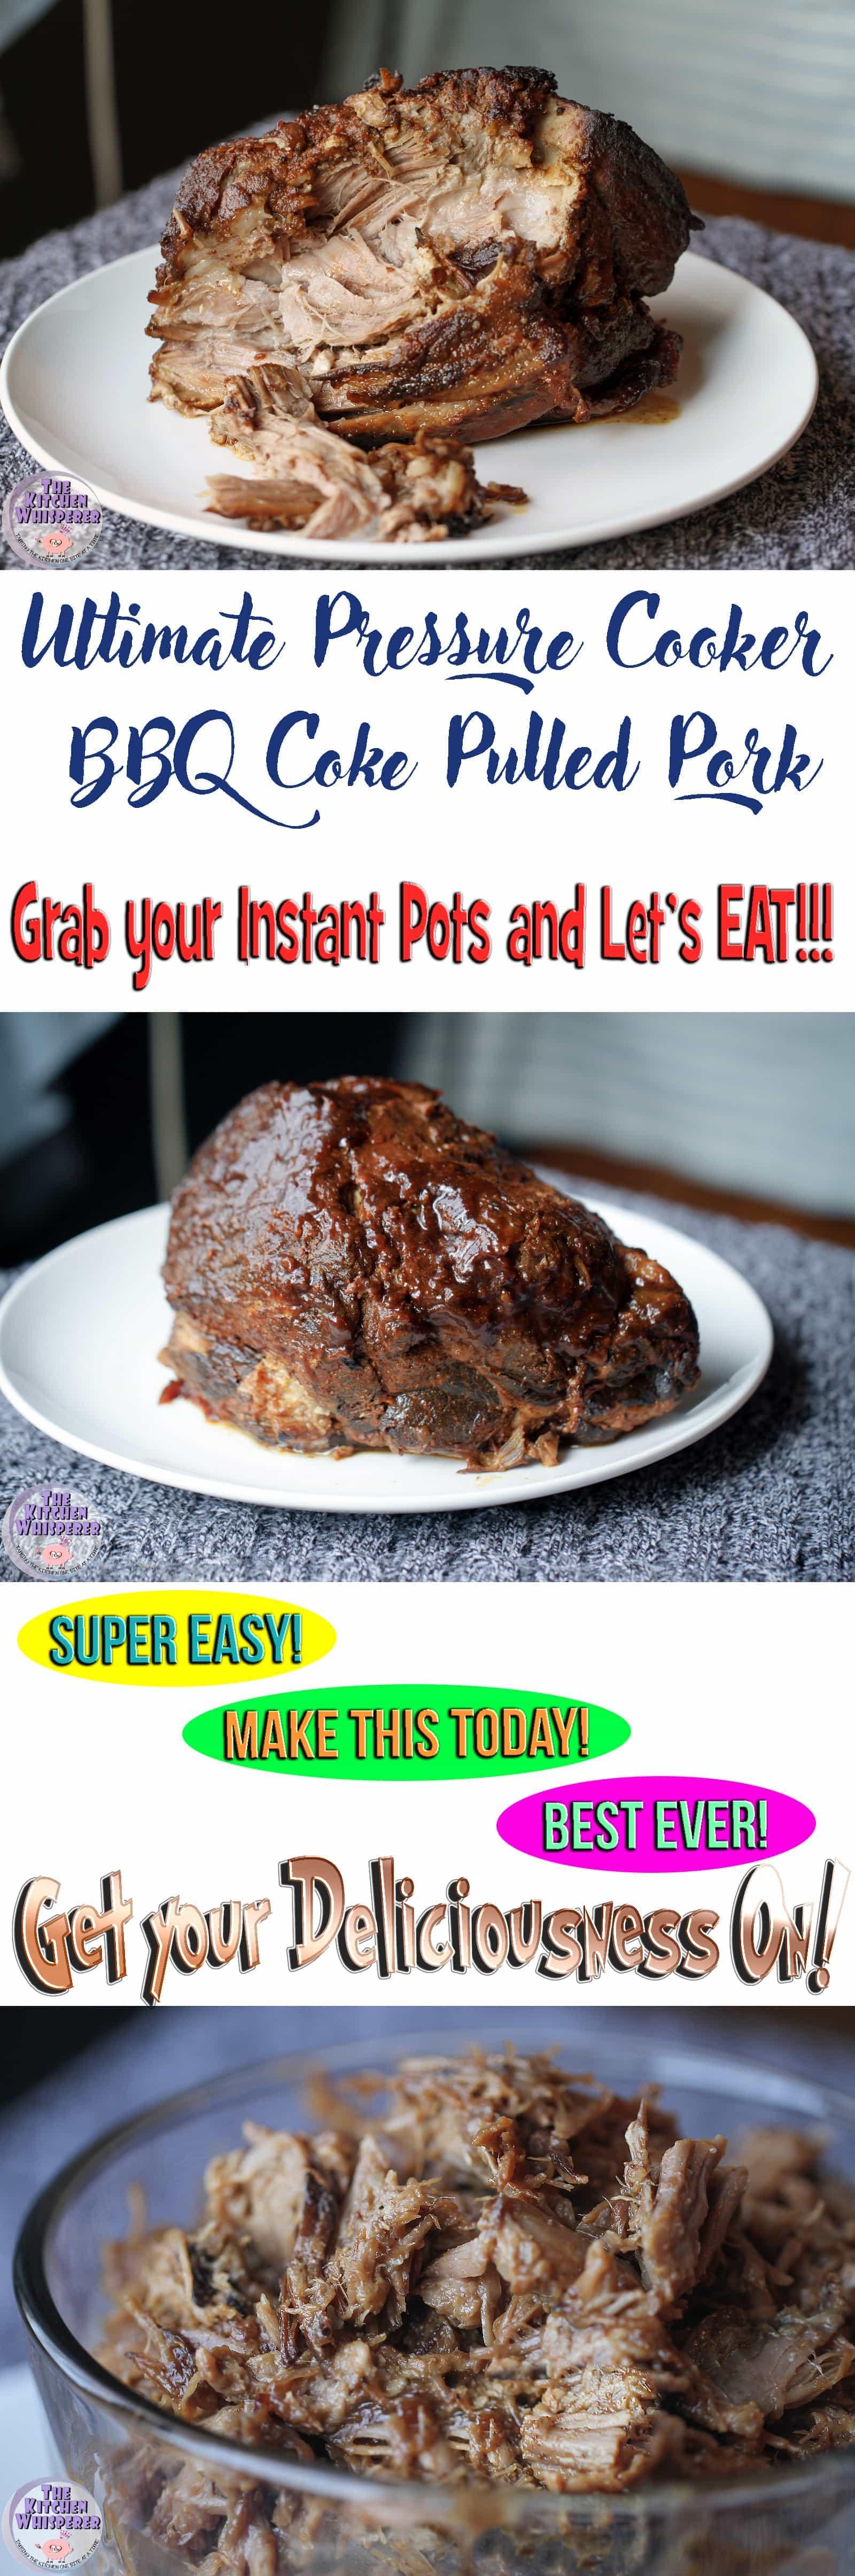 Ultimate Pressure Cooker BBQ Coke Pulled Pork Butt